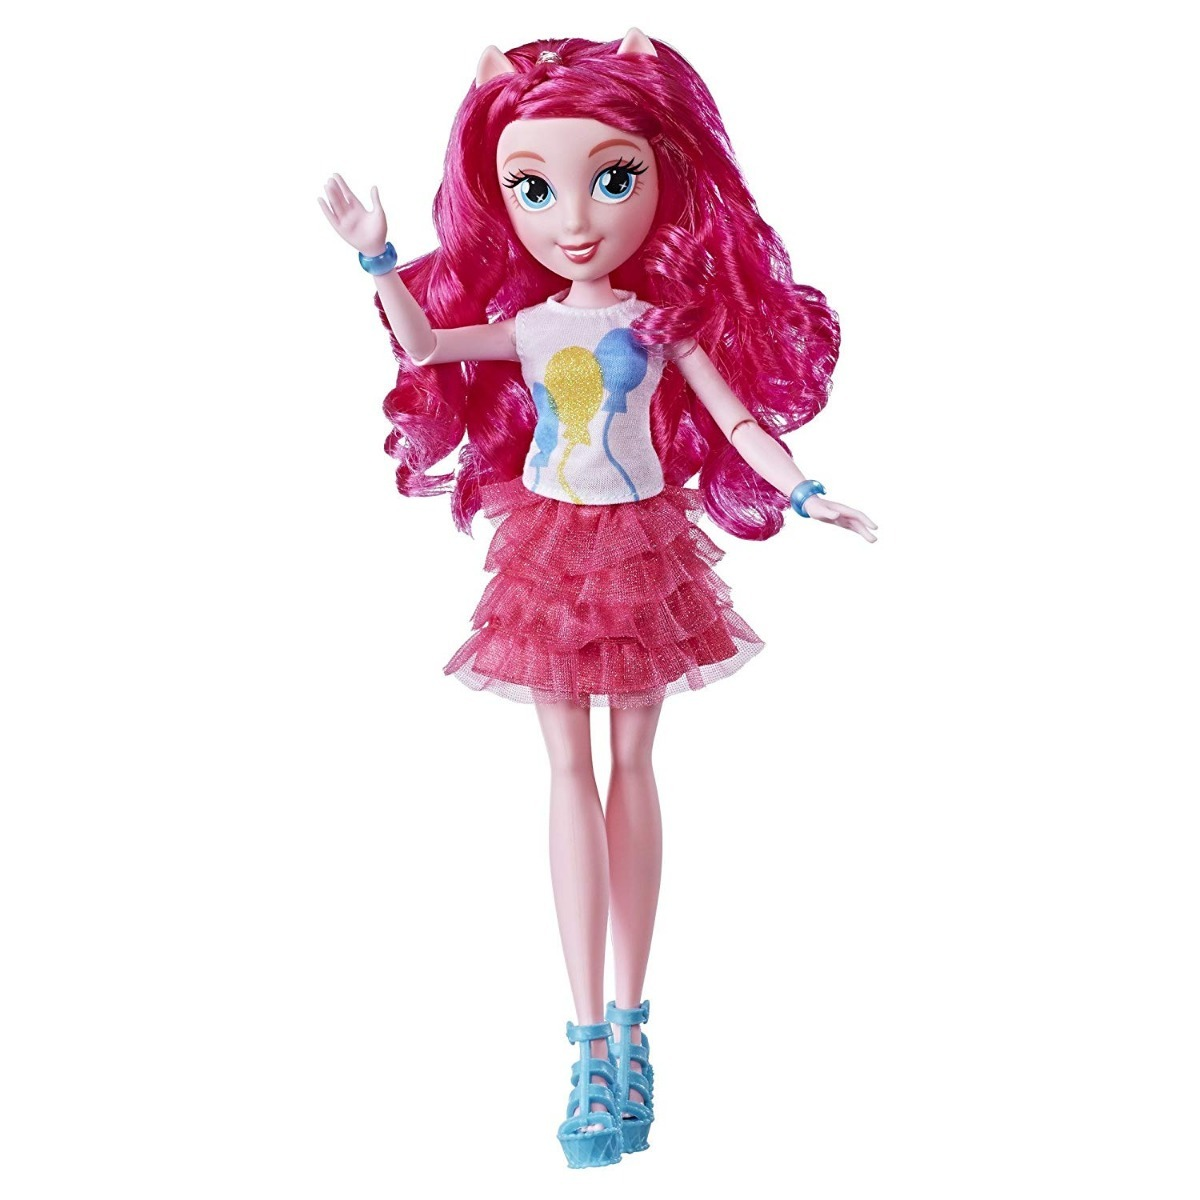 af086e7588f Muñeca Pinkie Pie Equestria Girls Little Pony E0348 -   549.00 en ...